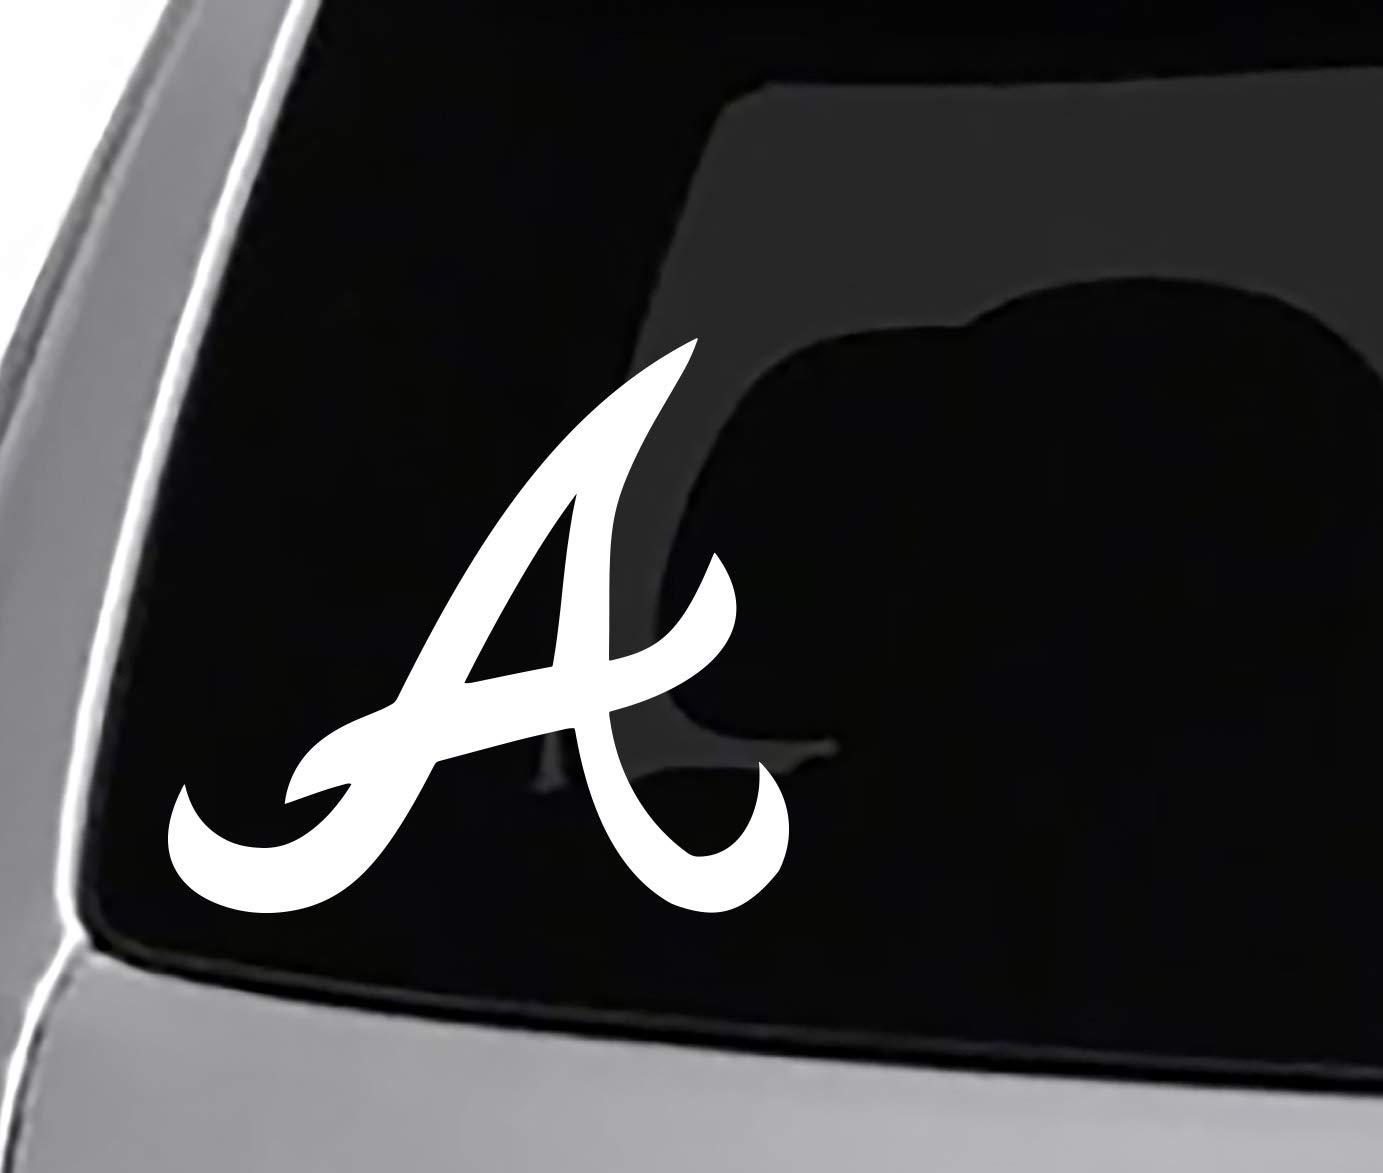 Seek Racing I Identify AS A Prius Decal CAR Truck Window Laptop Sticker